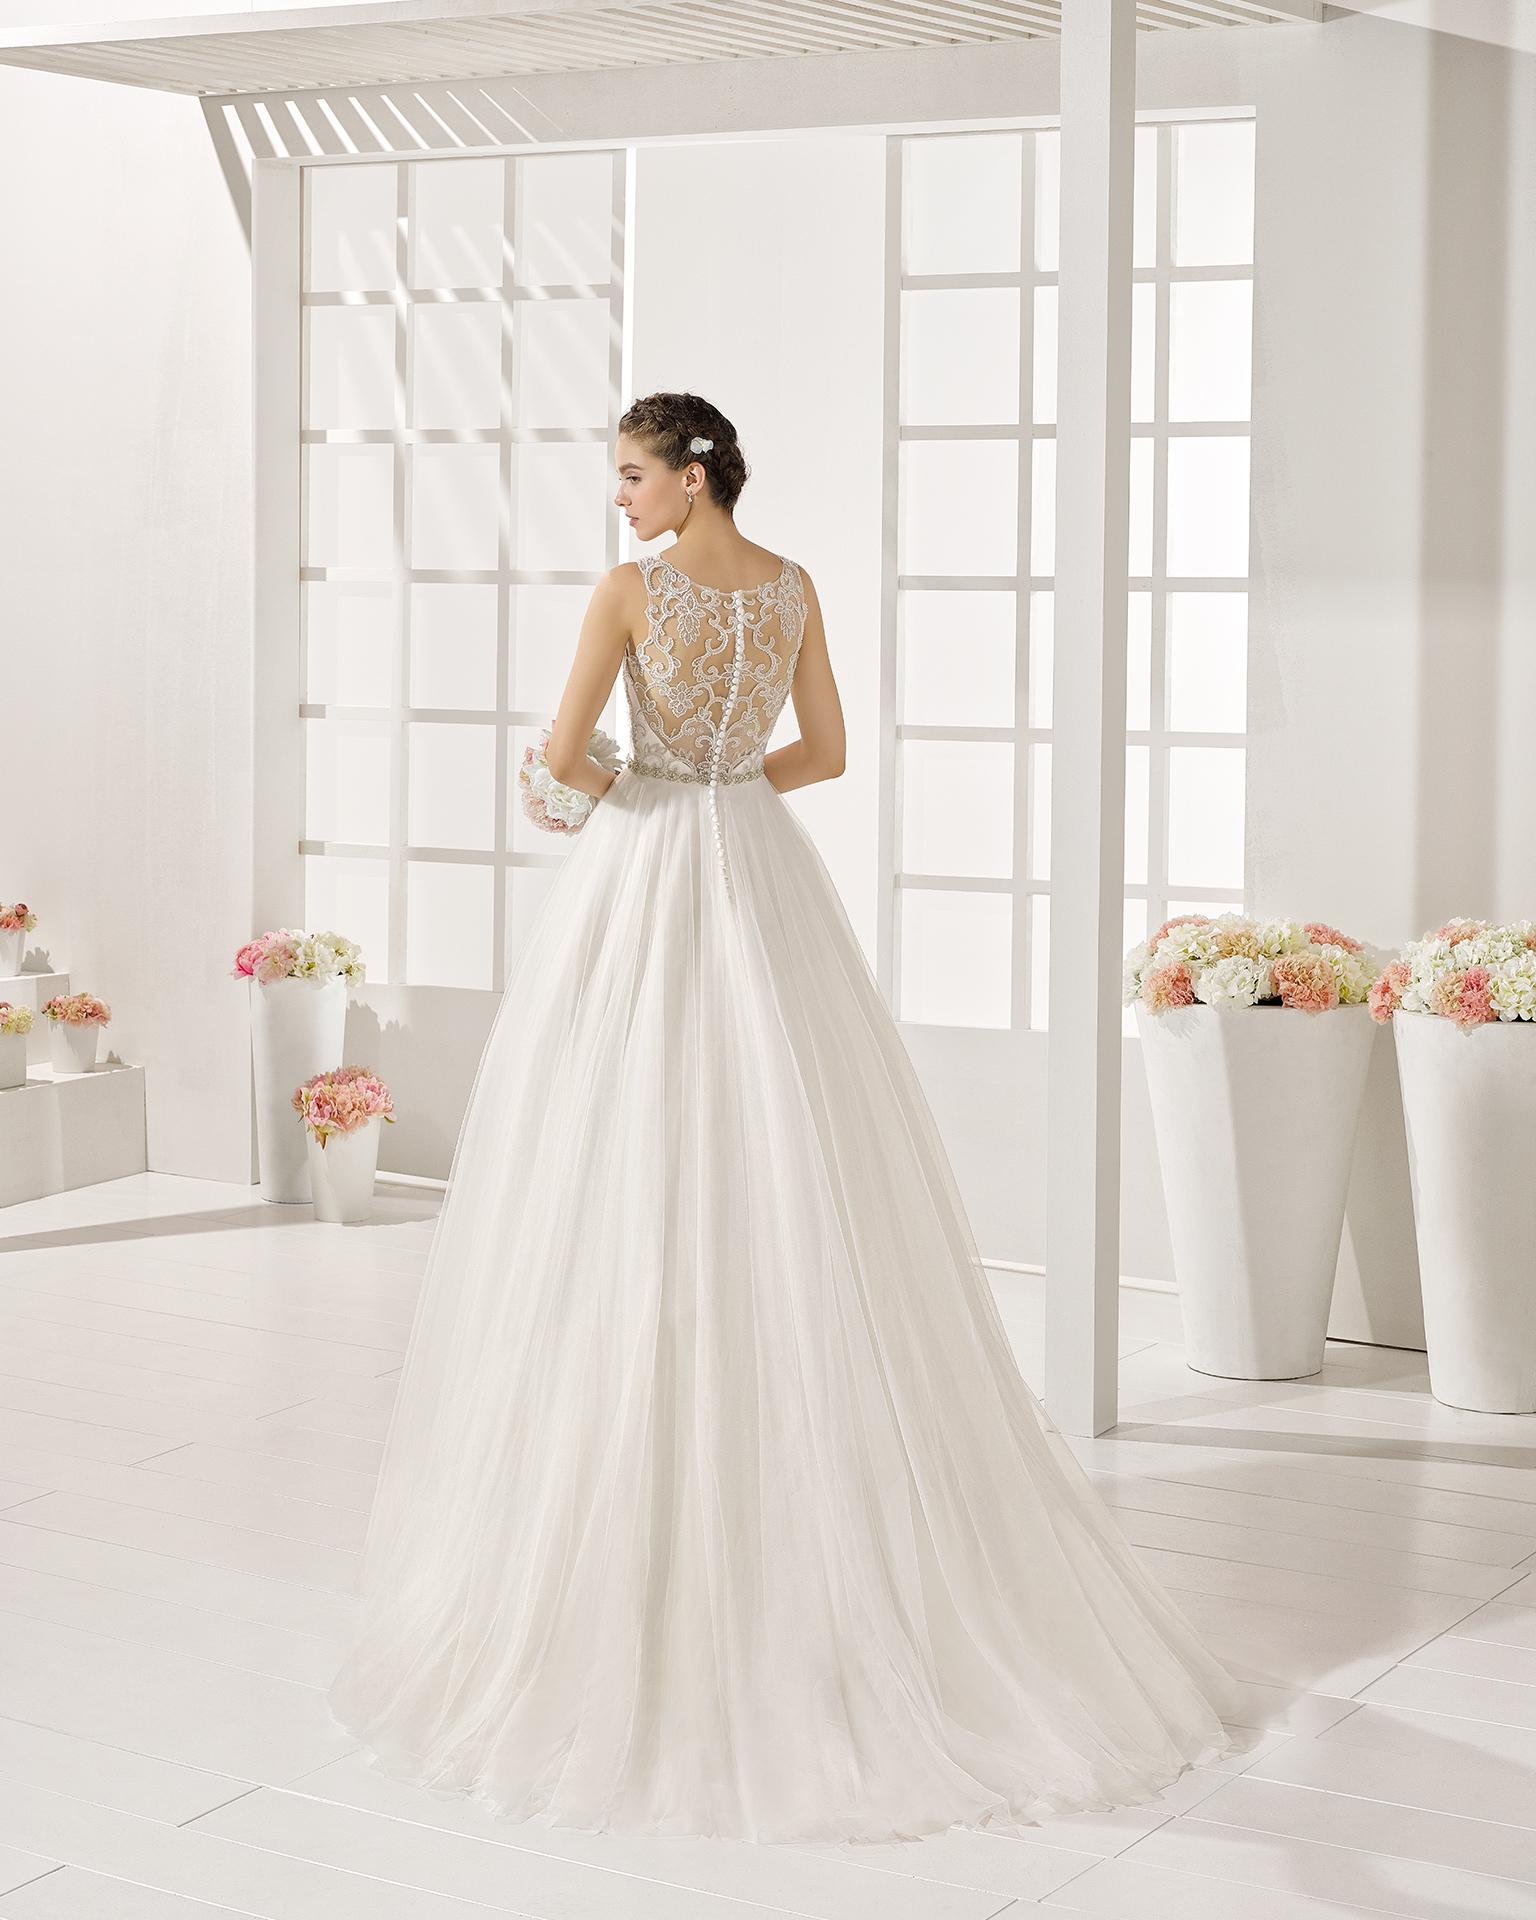 Yguazu wedding dress, Luna Novias 2017